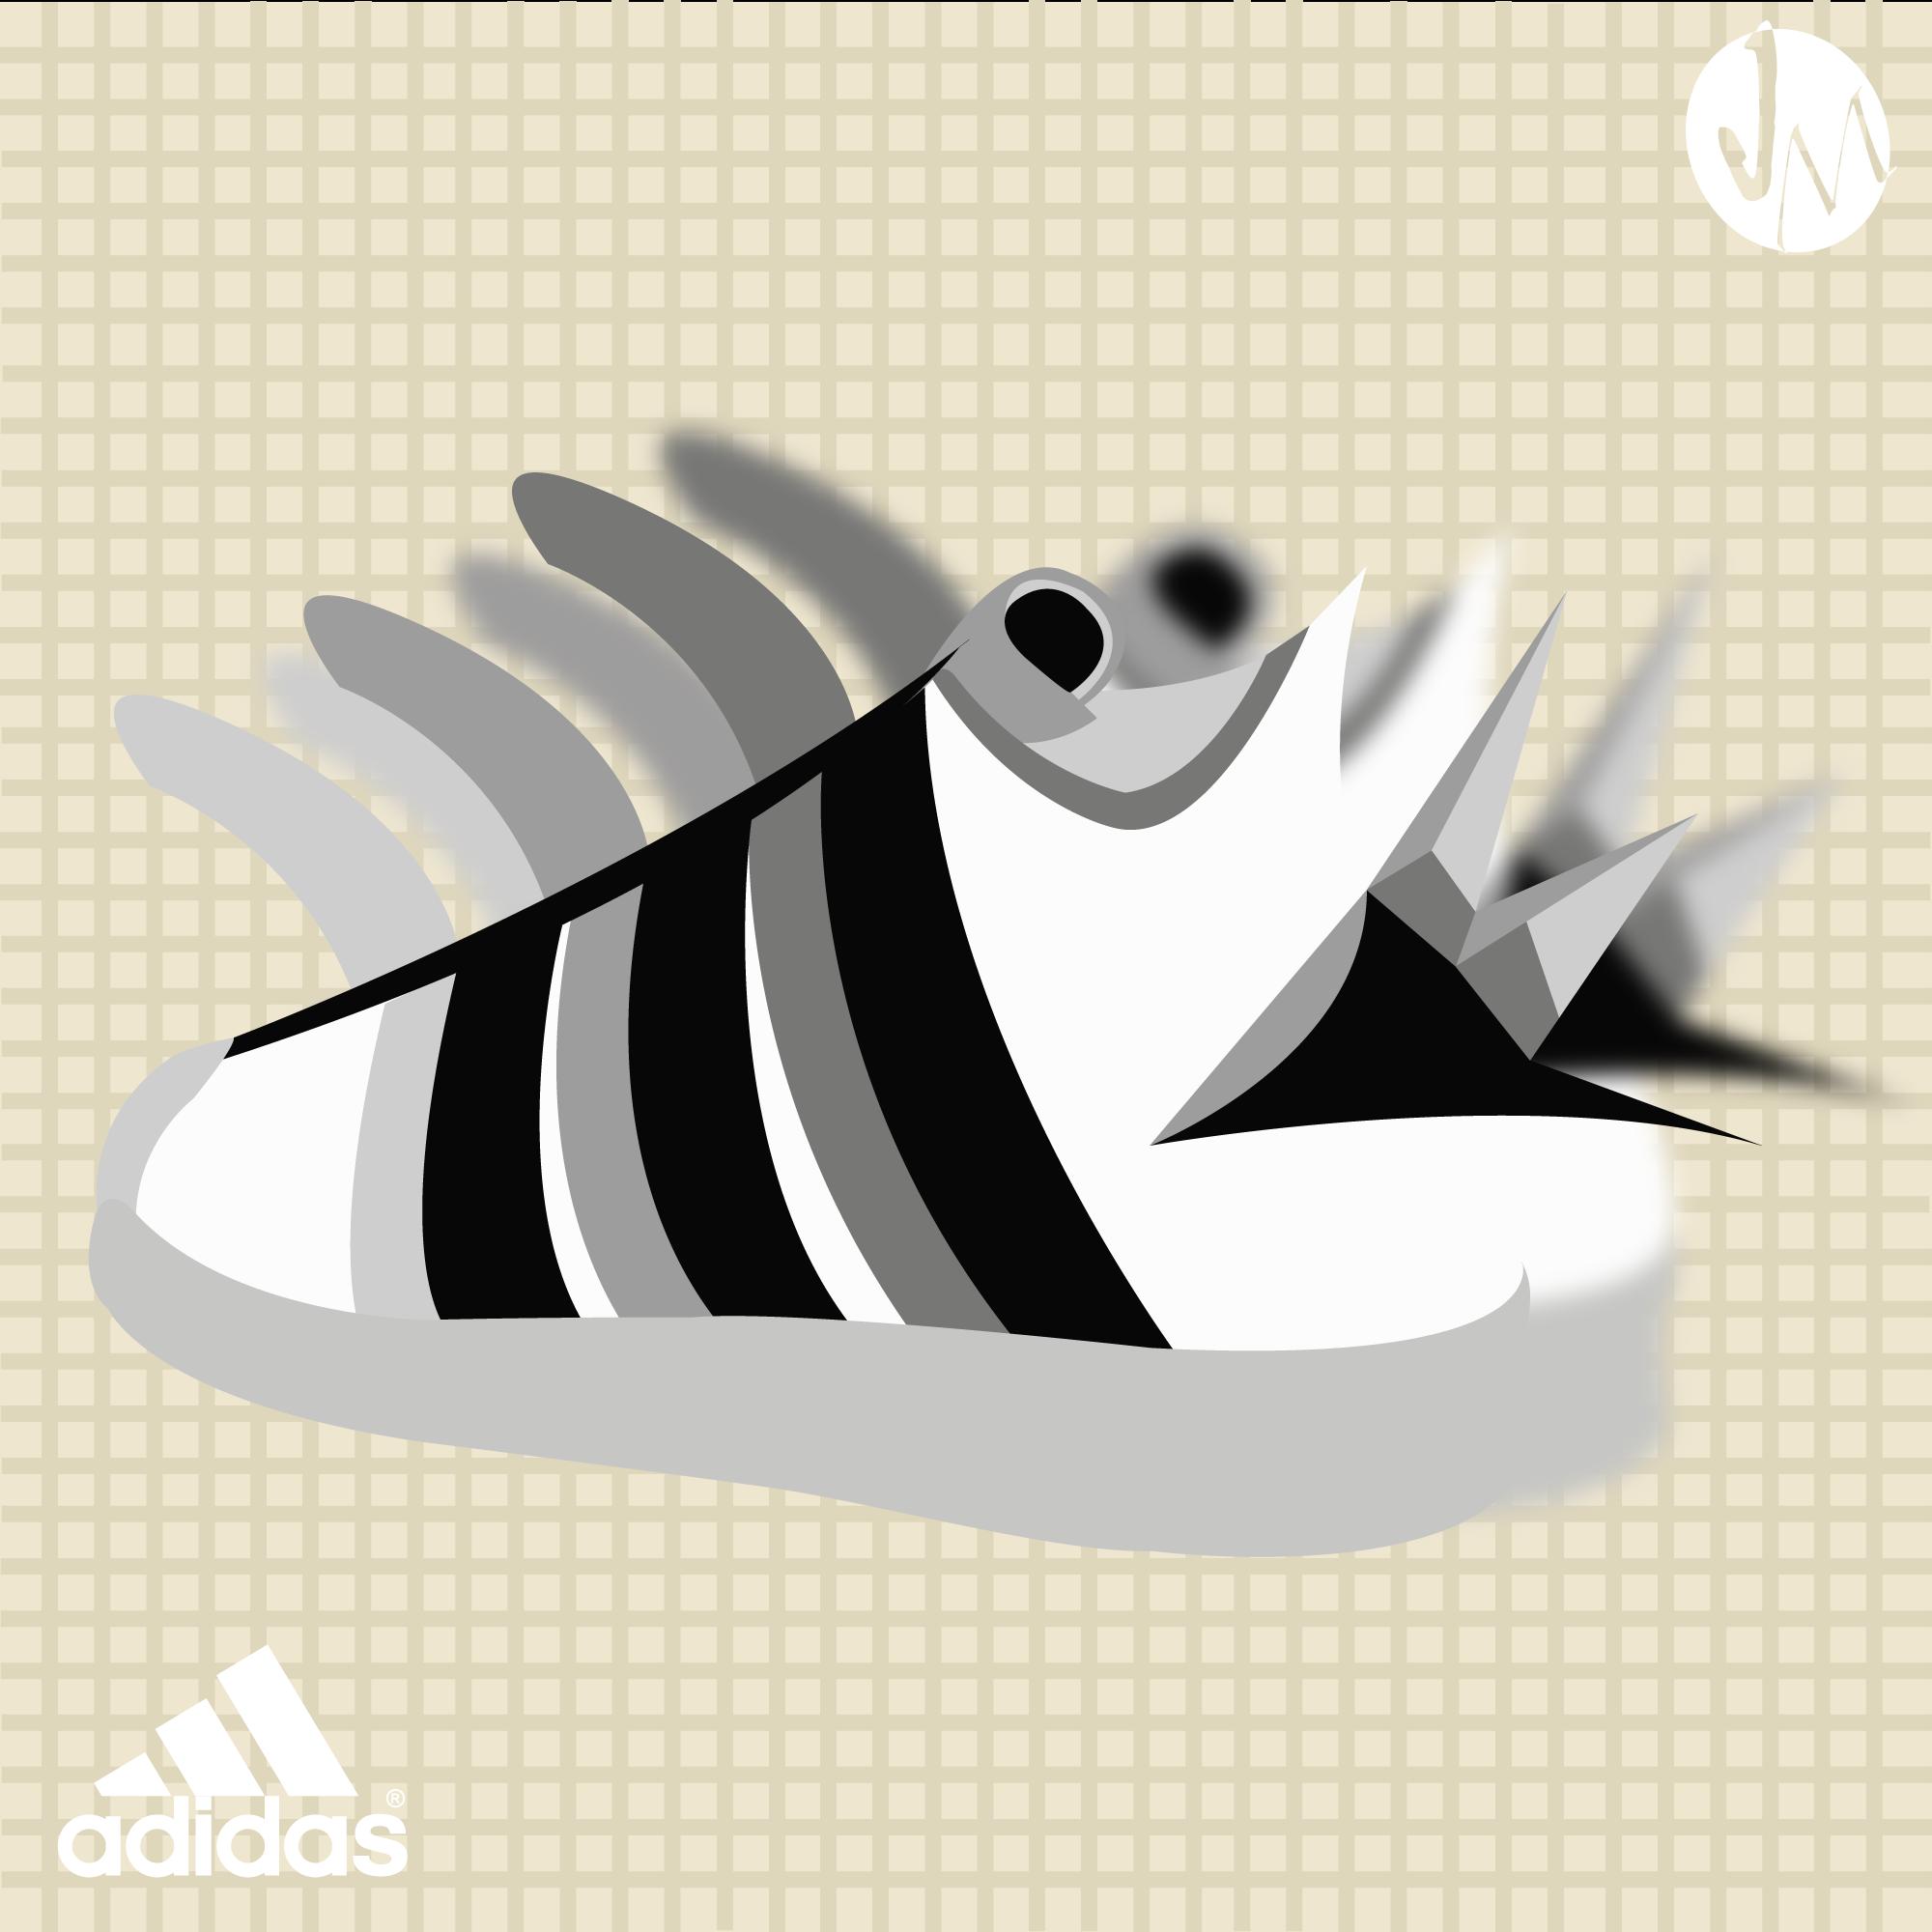 Adidas-Sunburst-High1.2.png